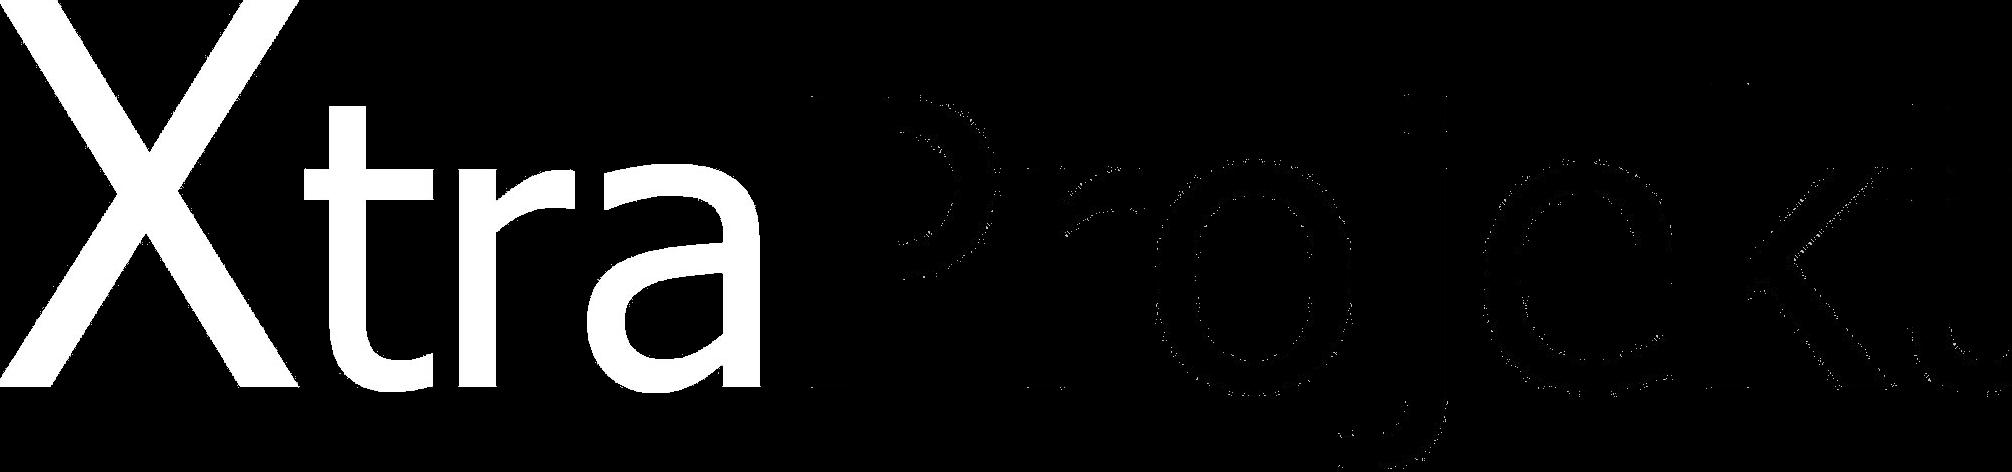 XtraProjekt Münster Wilhelm Niestrath Logo